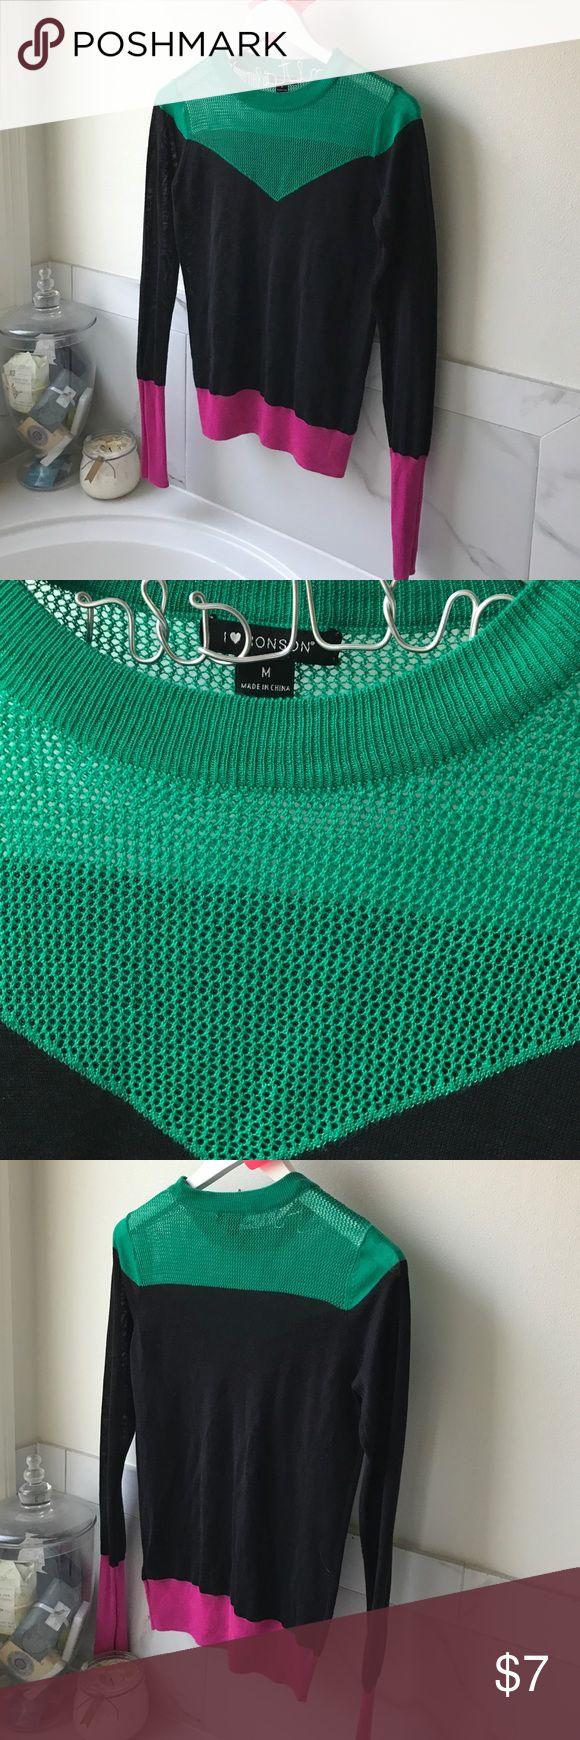 I ❤️ Ronson knit shirt Kelly green, navy blue & Fuchsia print knit long sleeve shirt. Worn once no flaws. Charlotte Ronson Tops Blouses